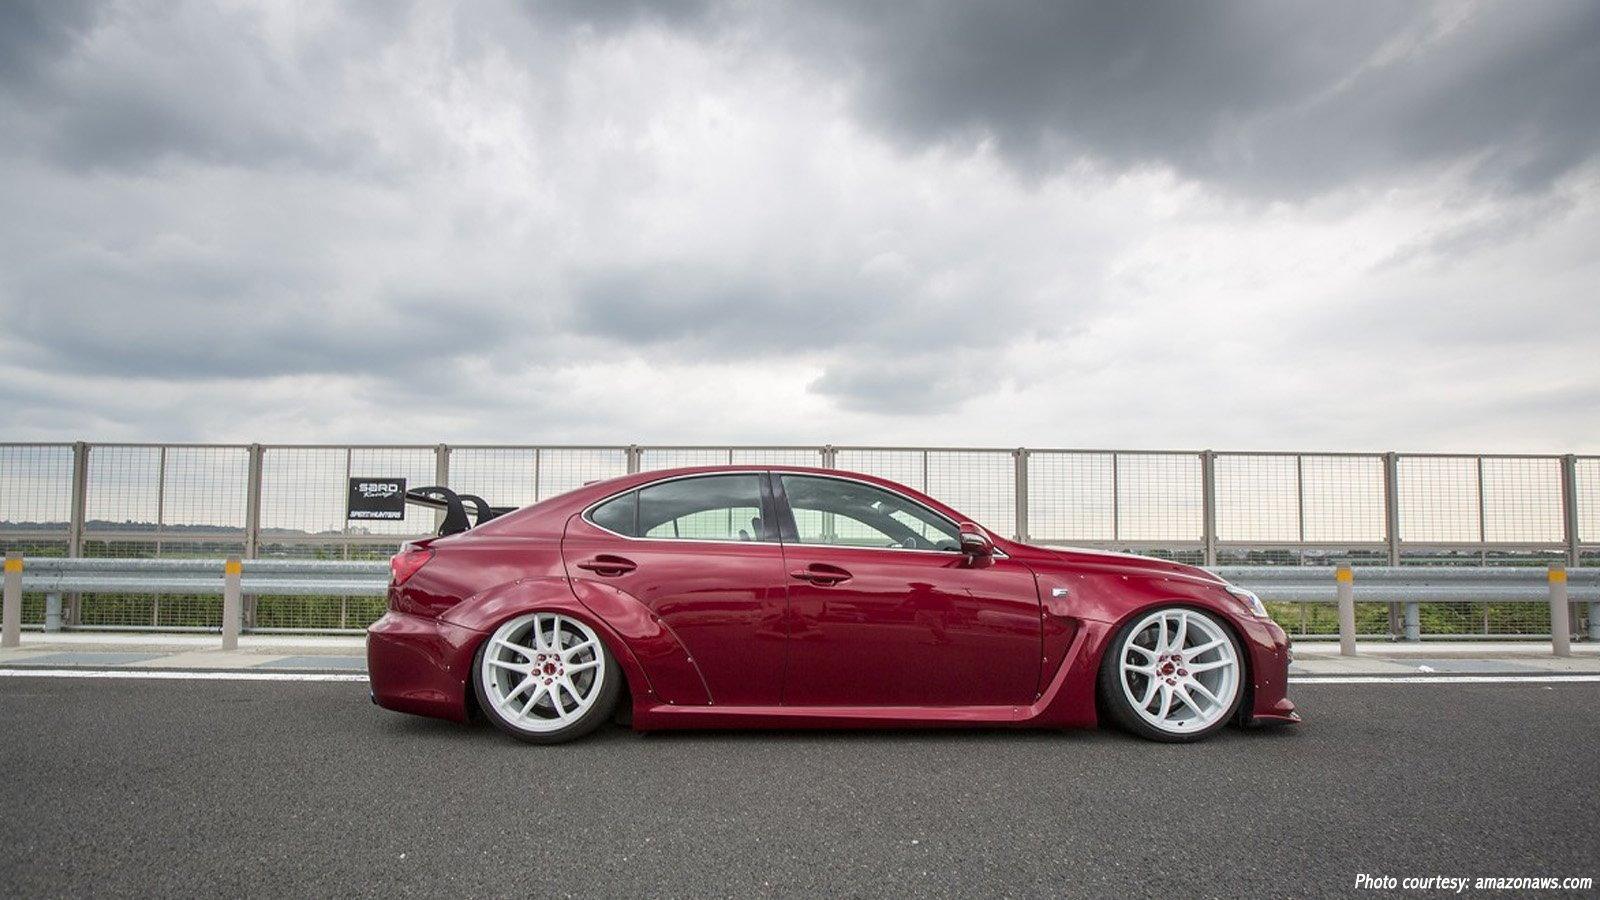 Club Lexus Members Share Their Favorite Mods